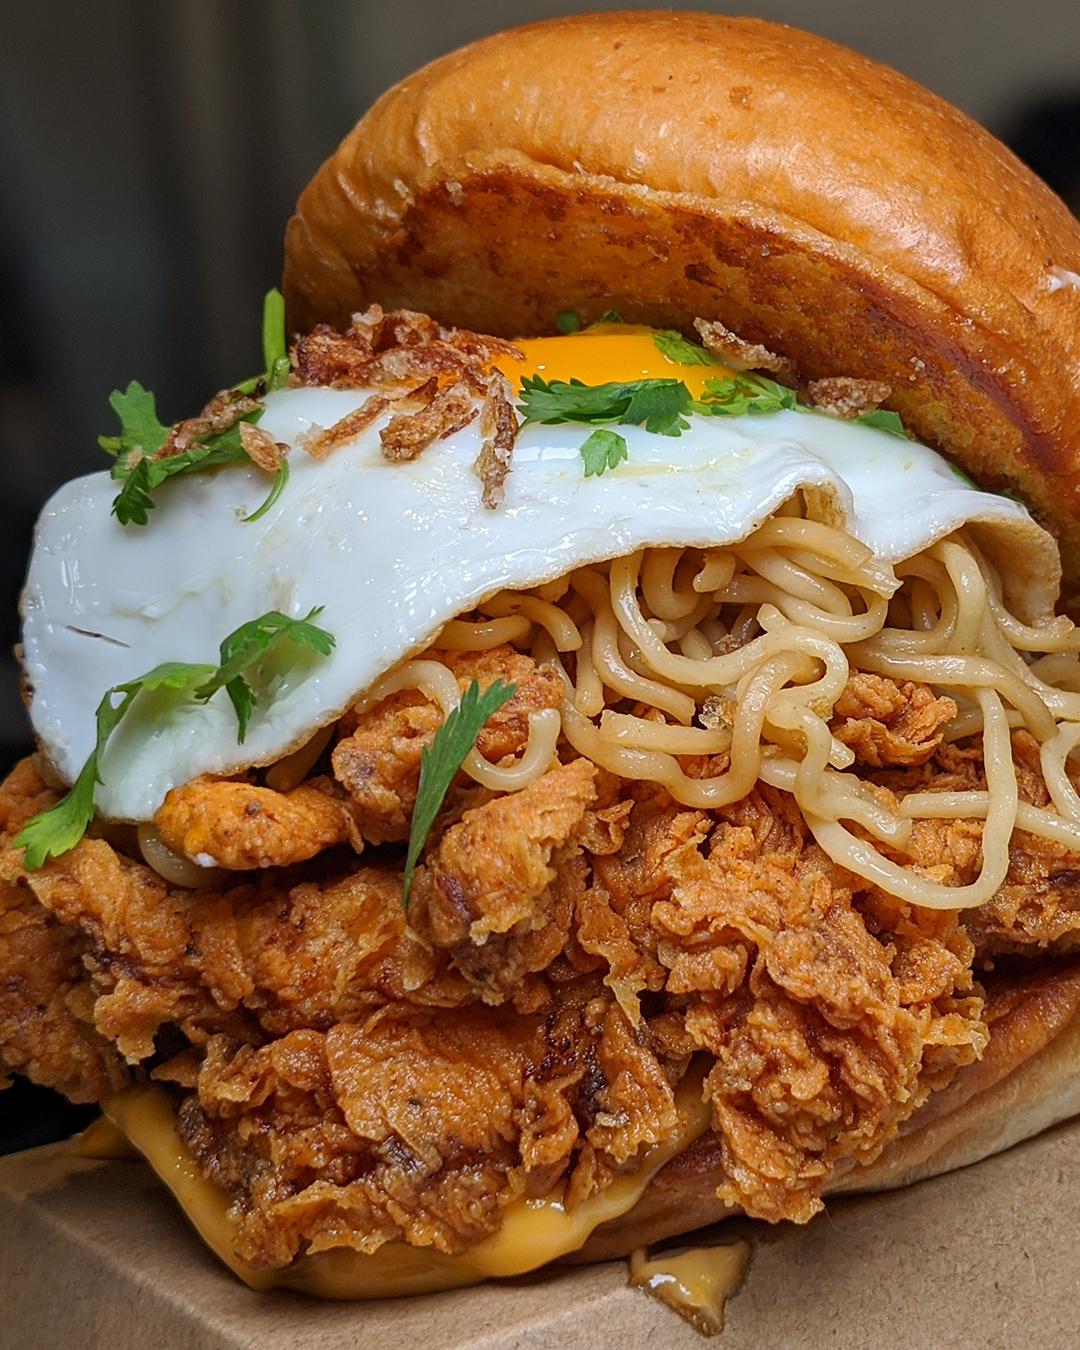 mi goreng burger with fried chicken